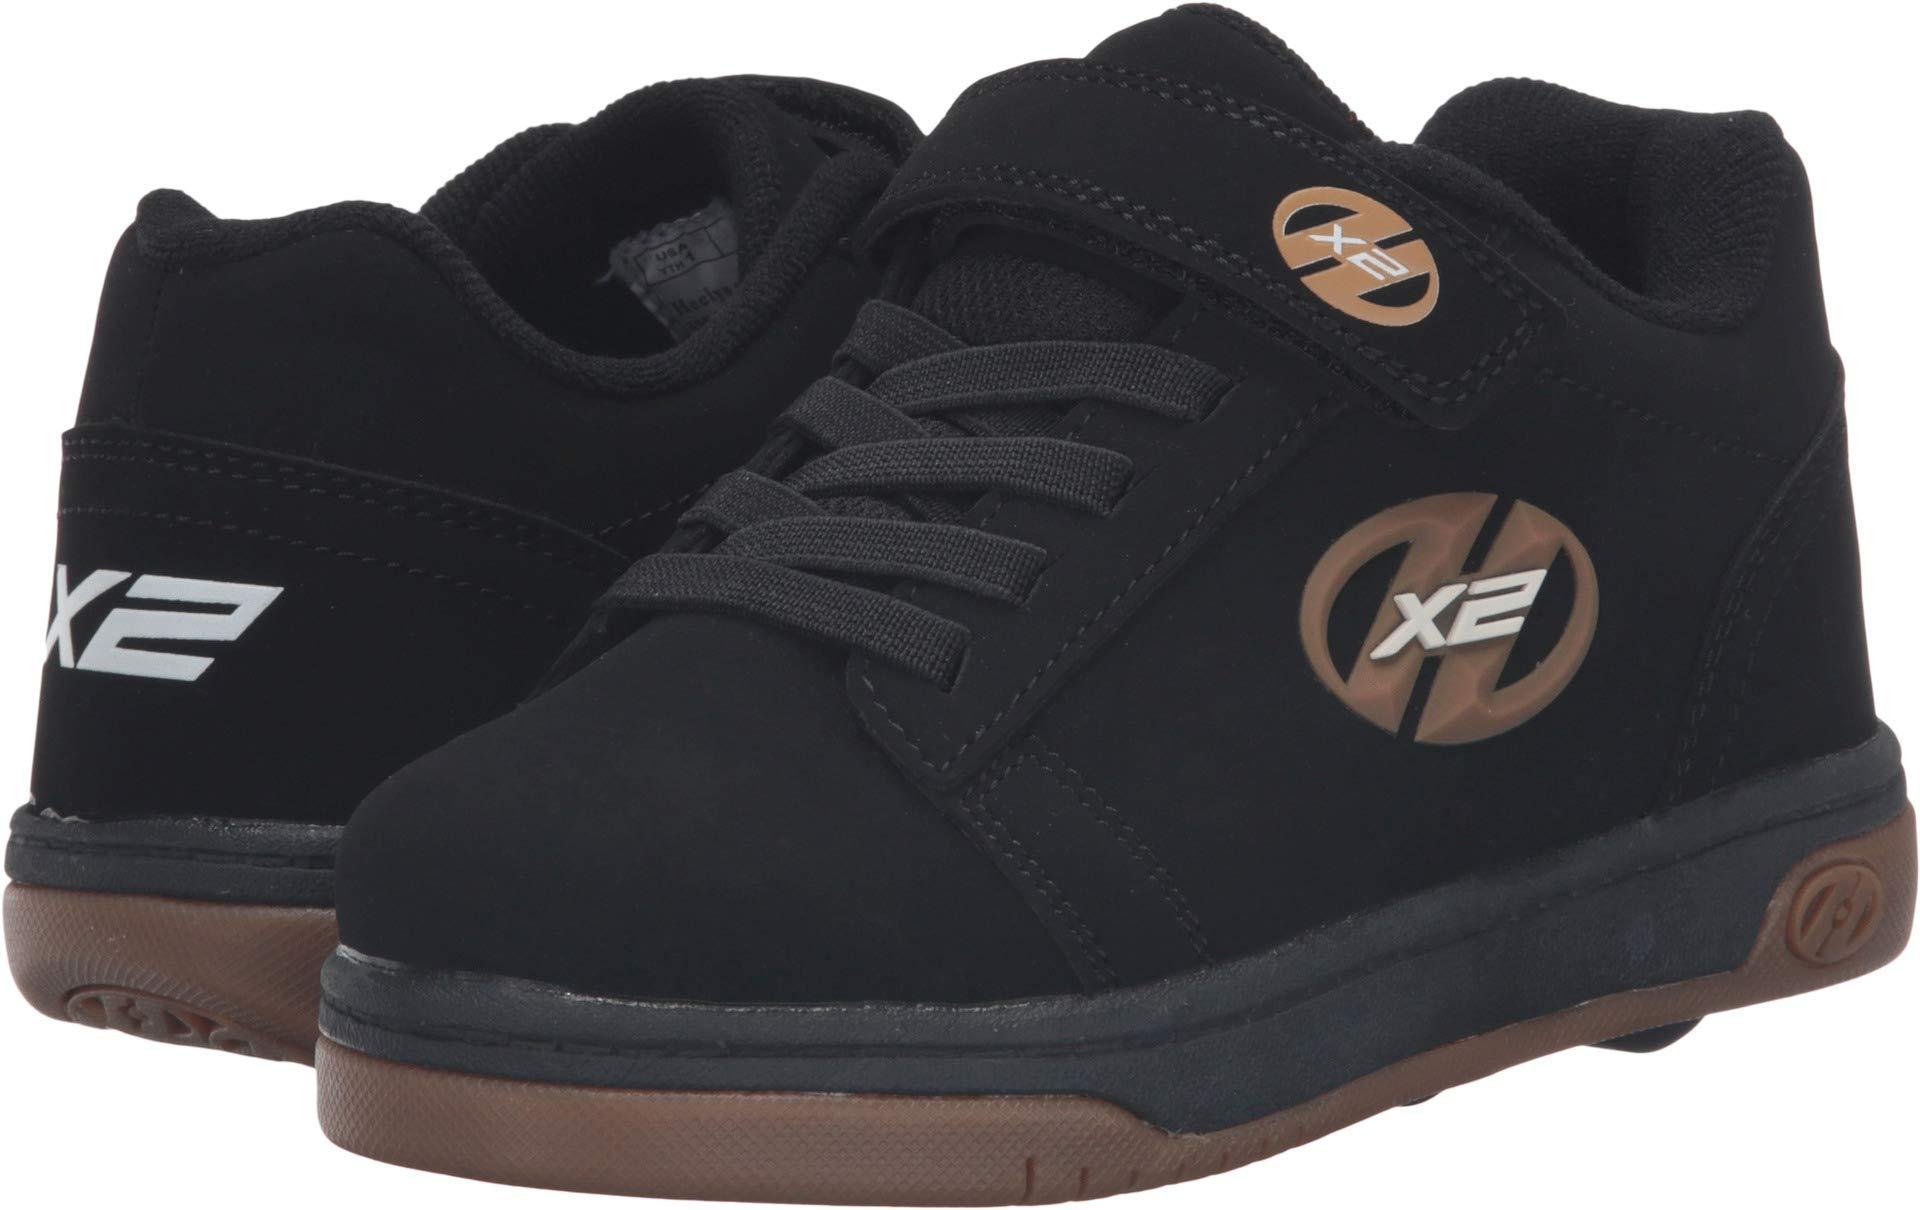 Heelys Dual Up X2 PU Sneaker Black-T, 1 M US Little Kid